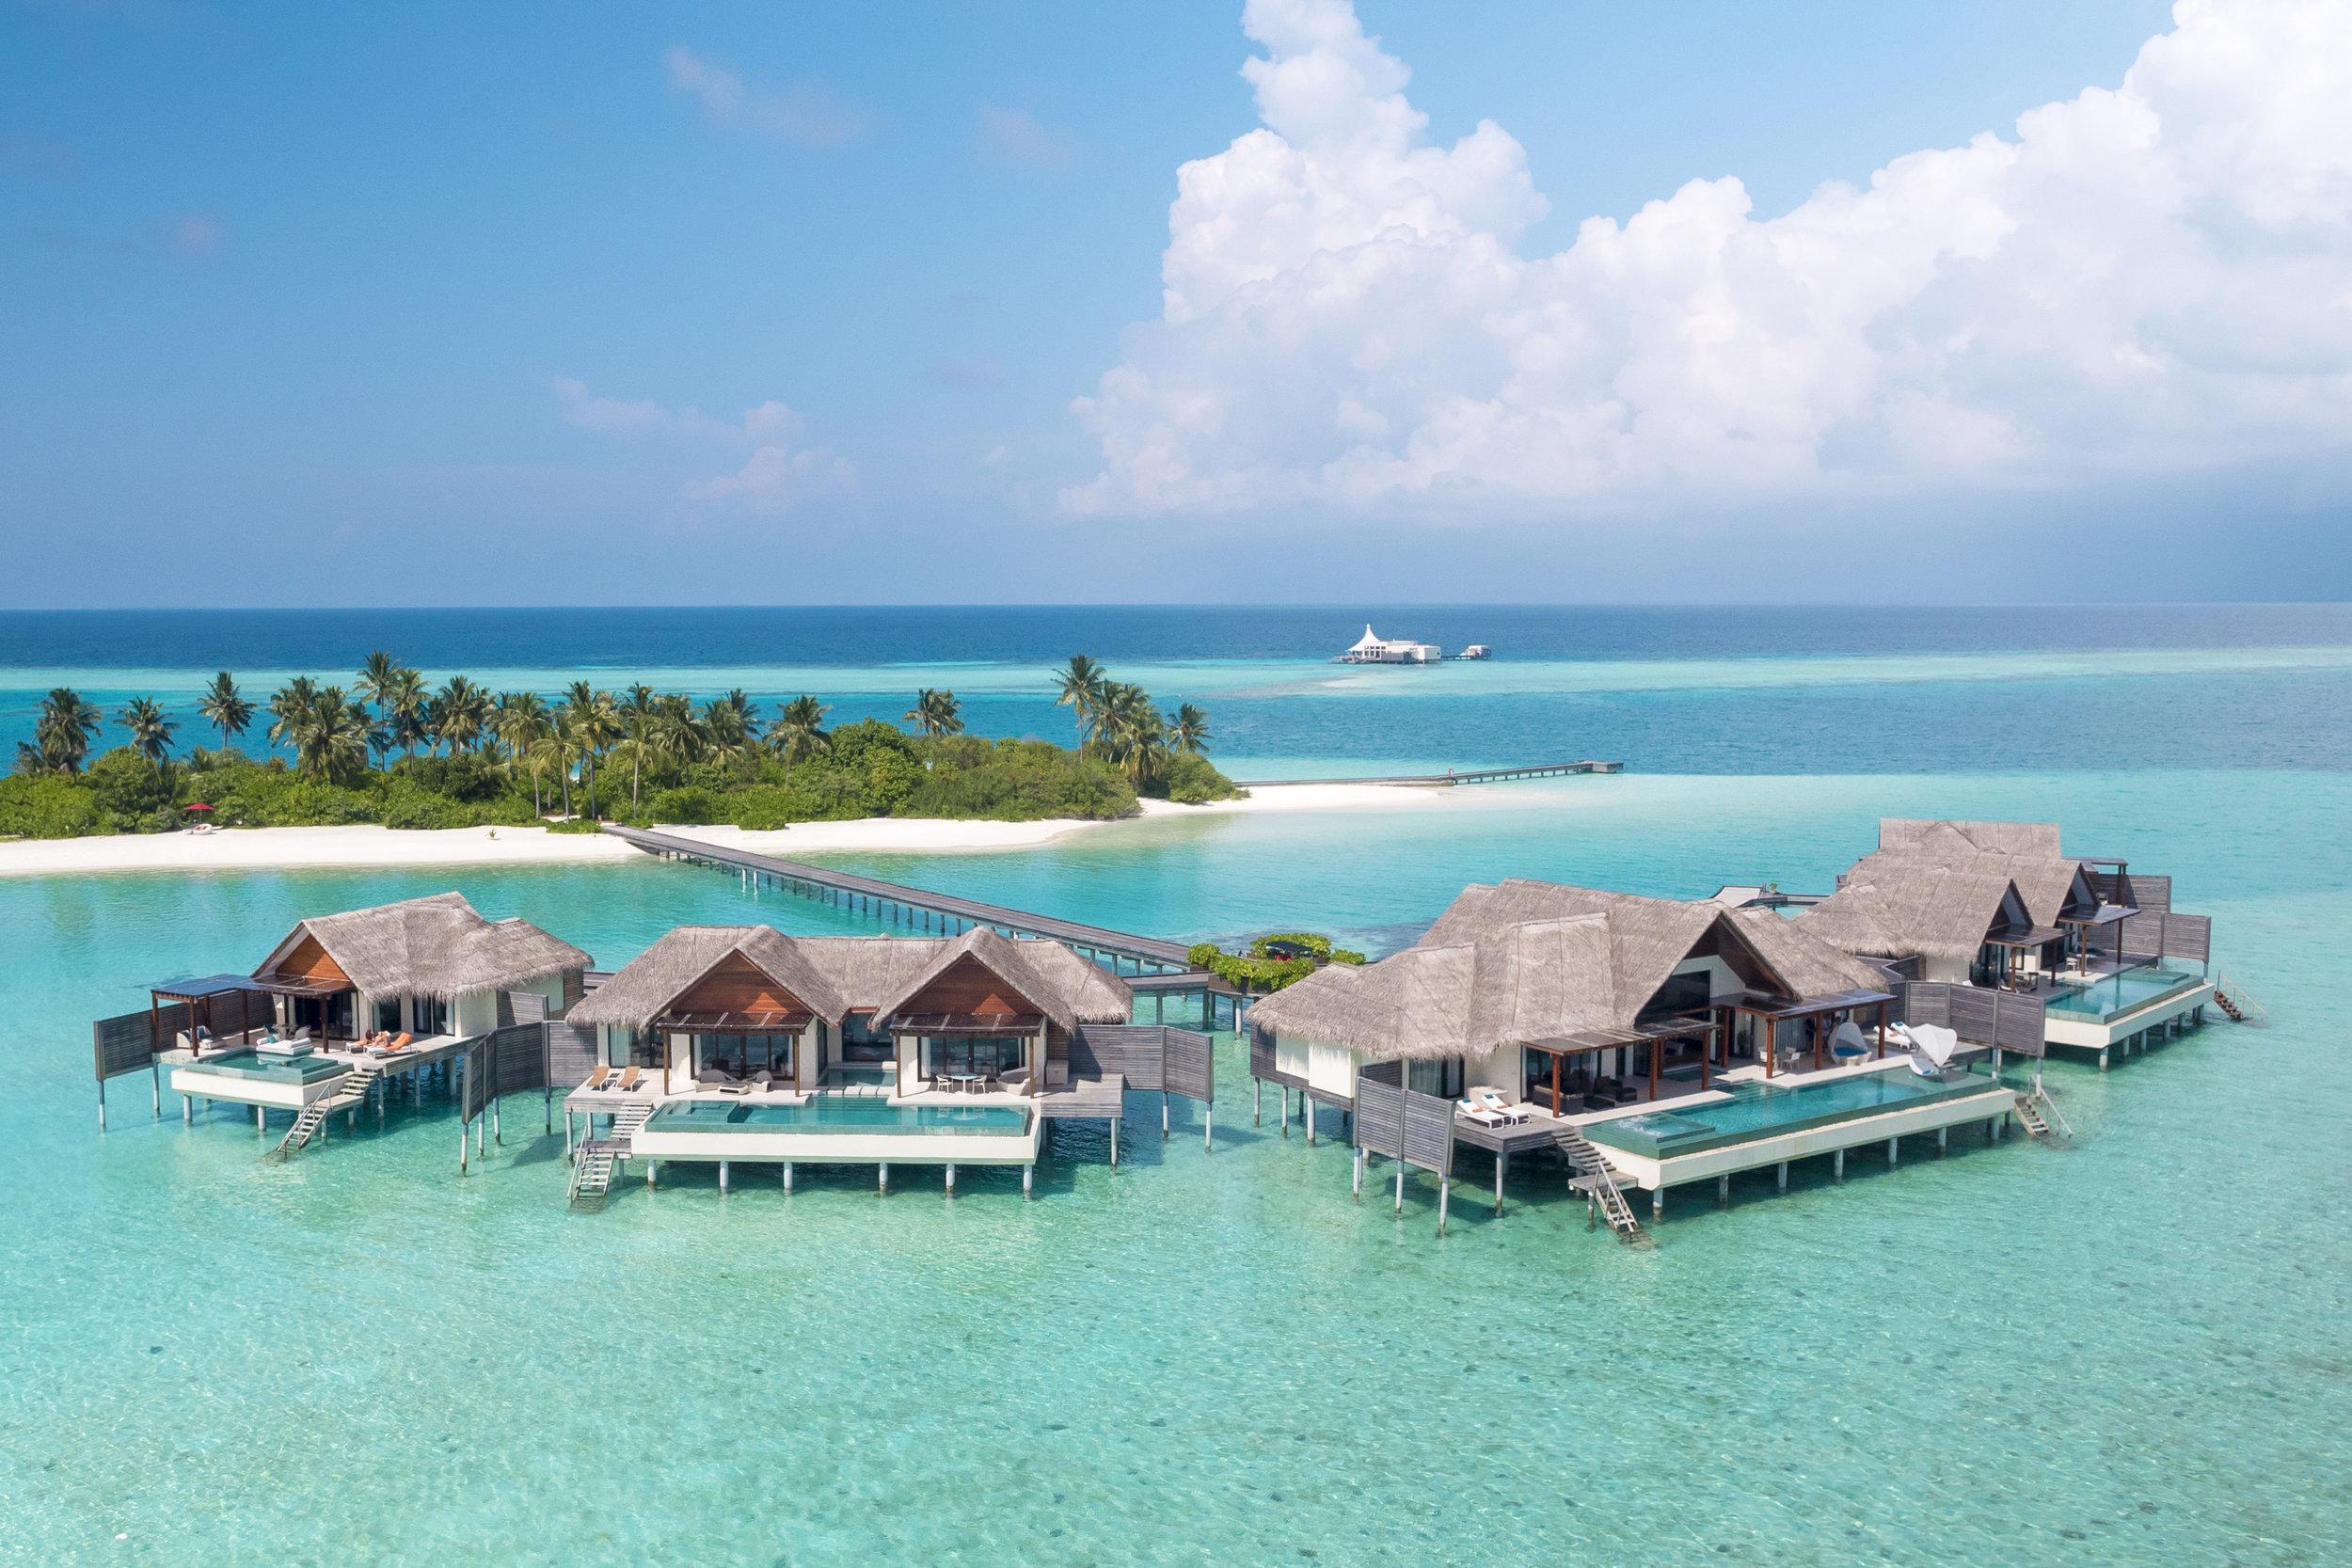 PER AQUUM Niyama - THE MALDIVES